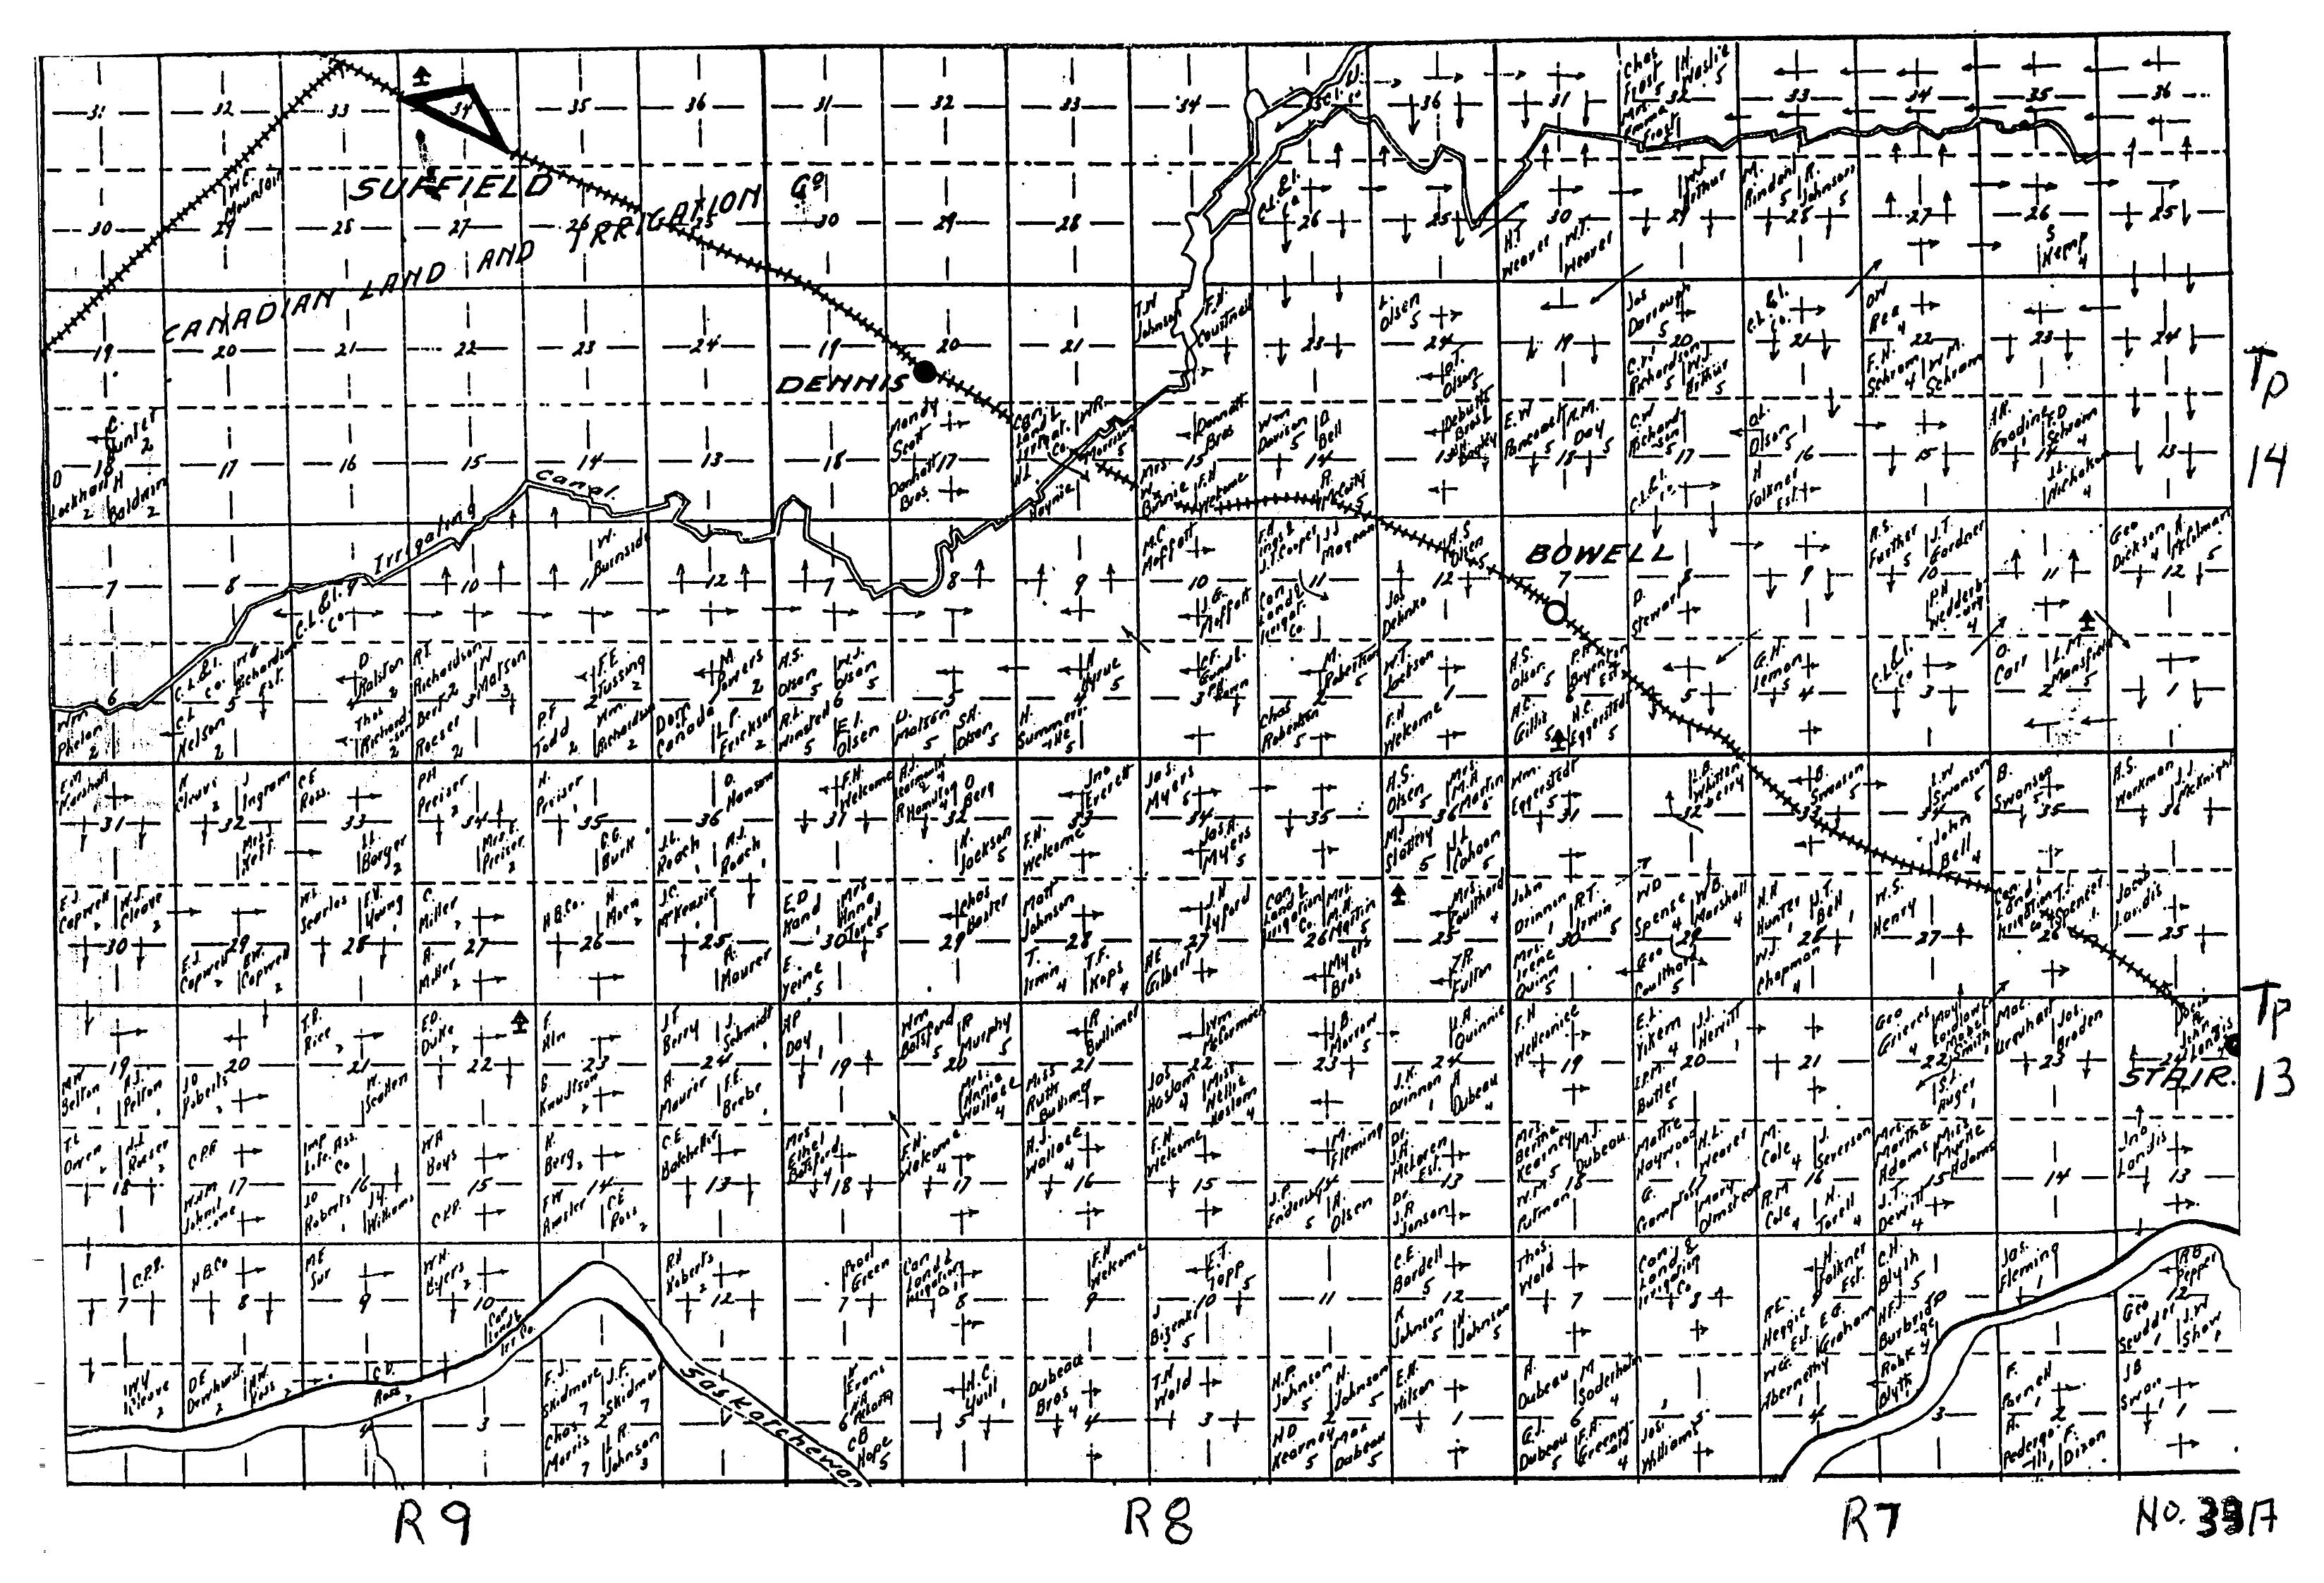 FileAlbertaHomesteadMap1918 t1314 r79 map33apng Wikipedia